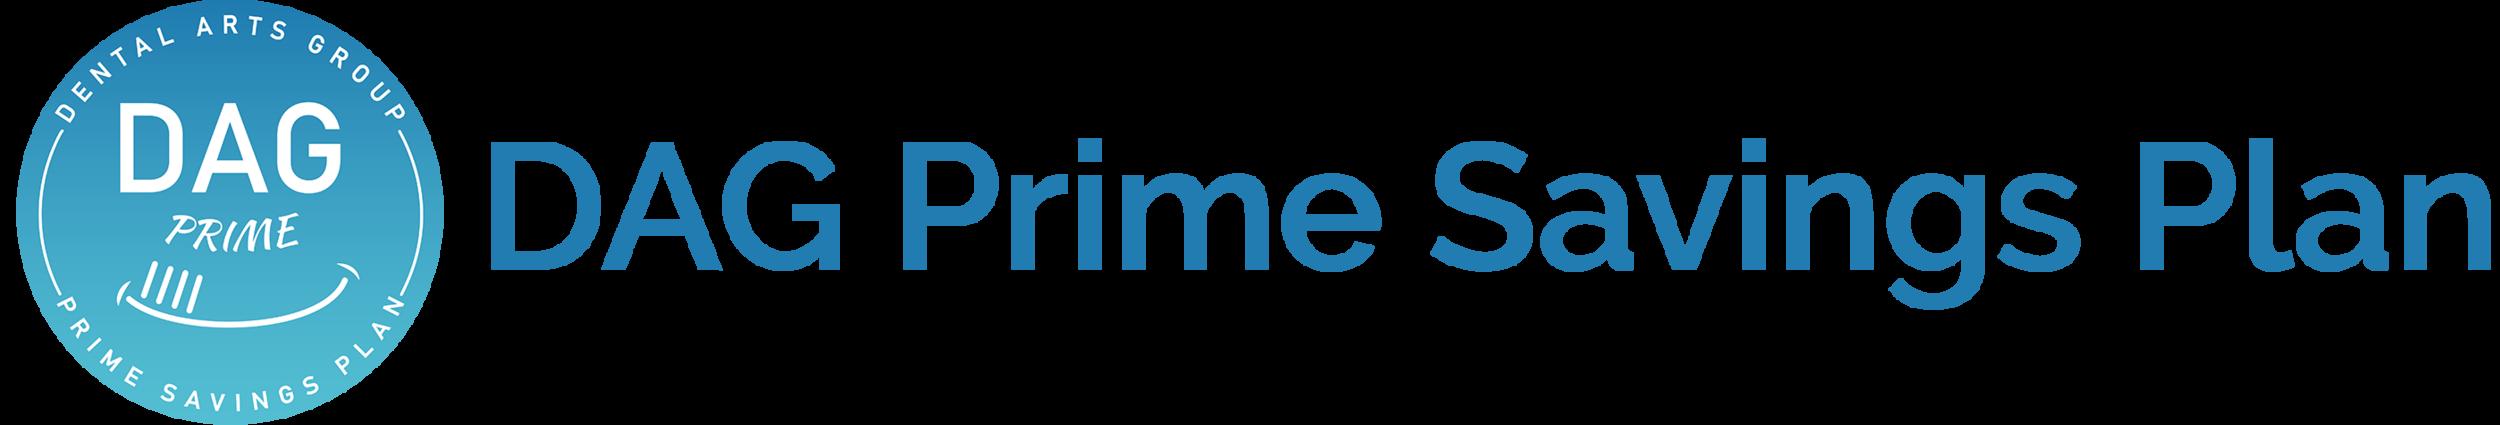 DAG Prime Savings Plan